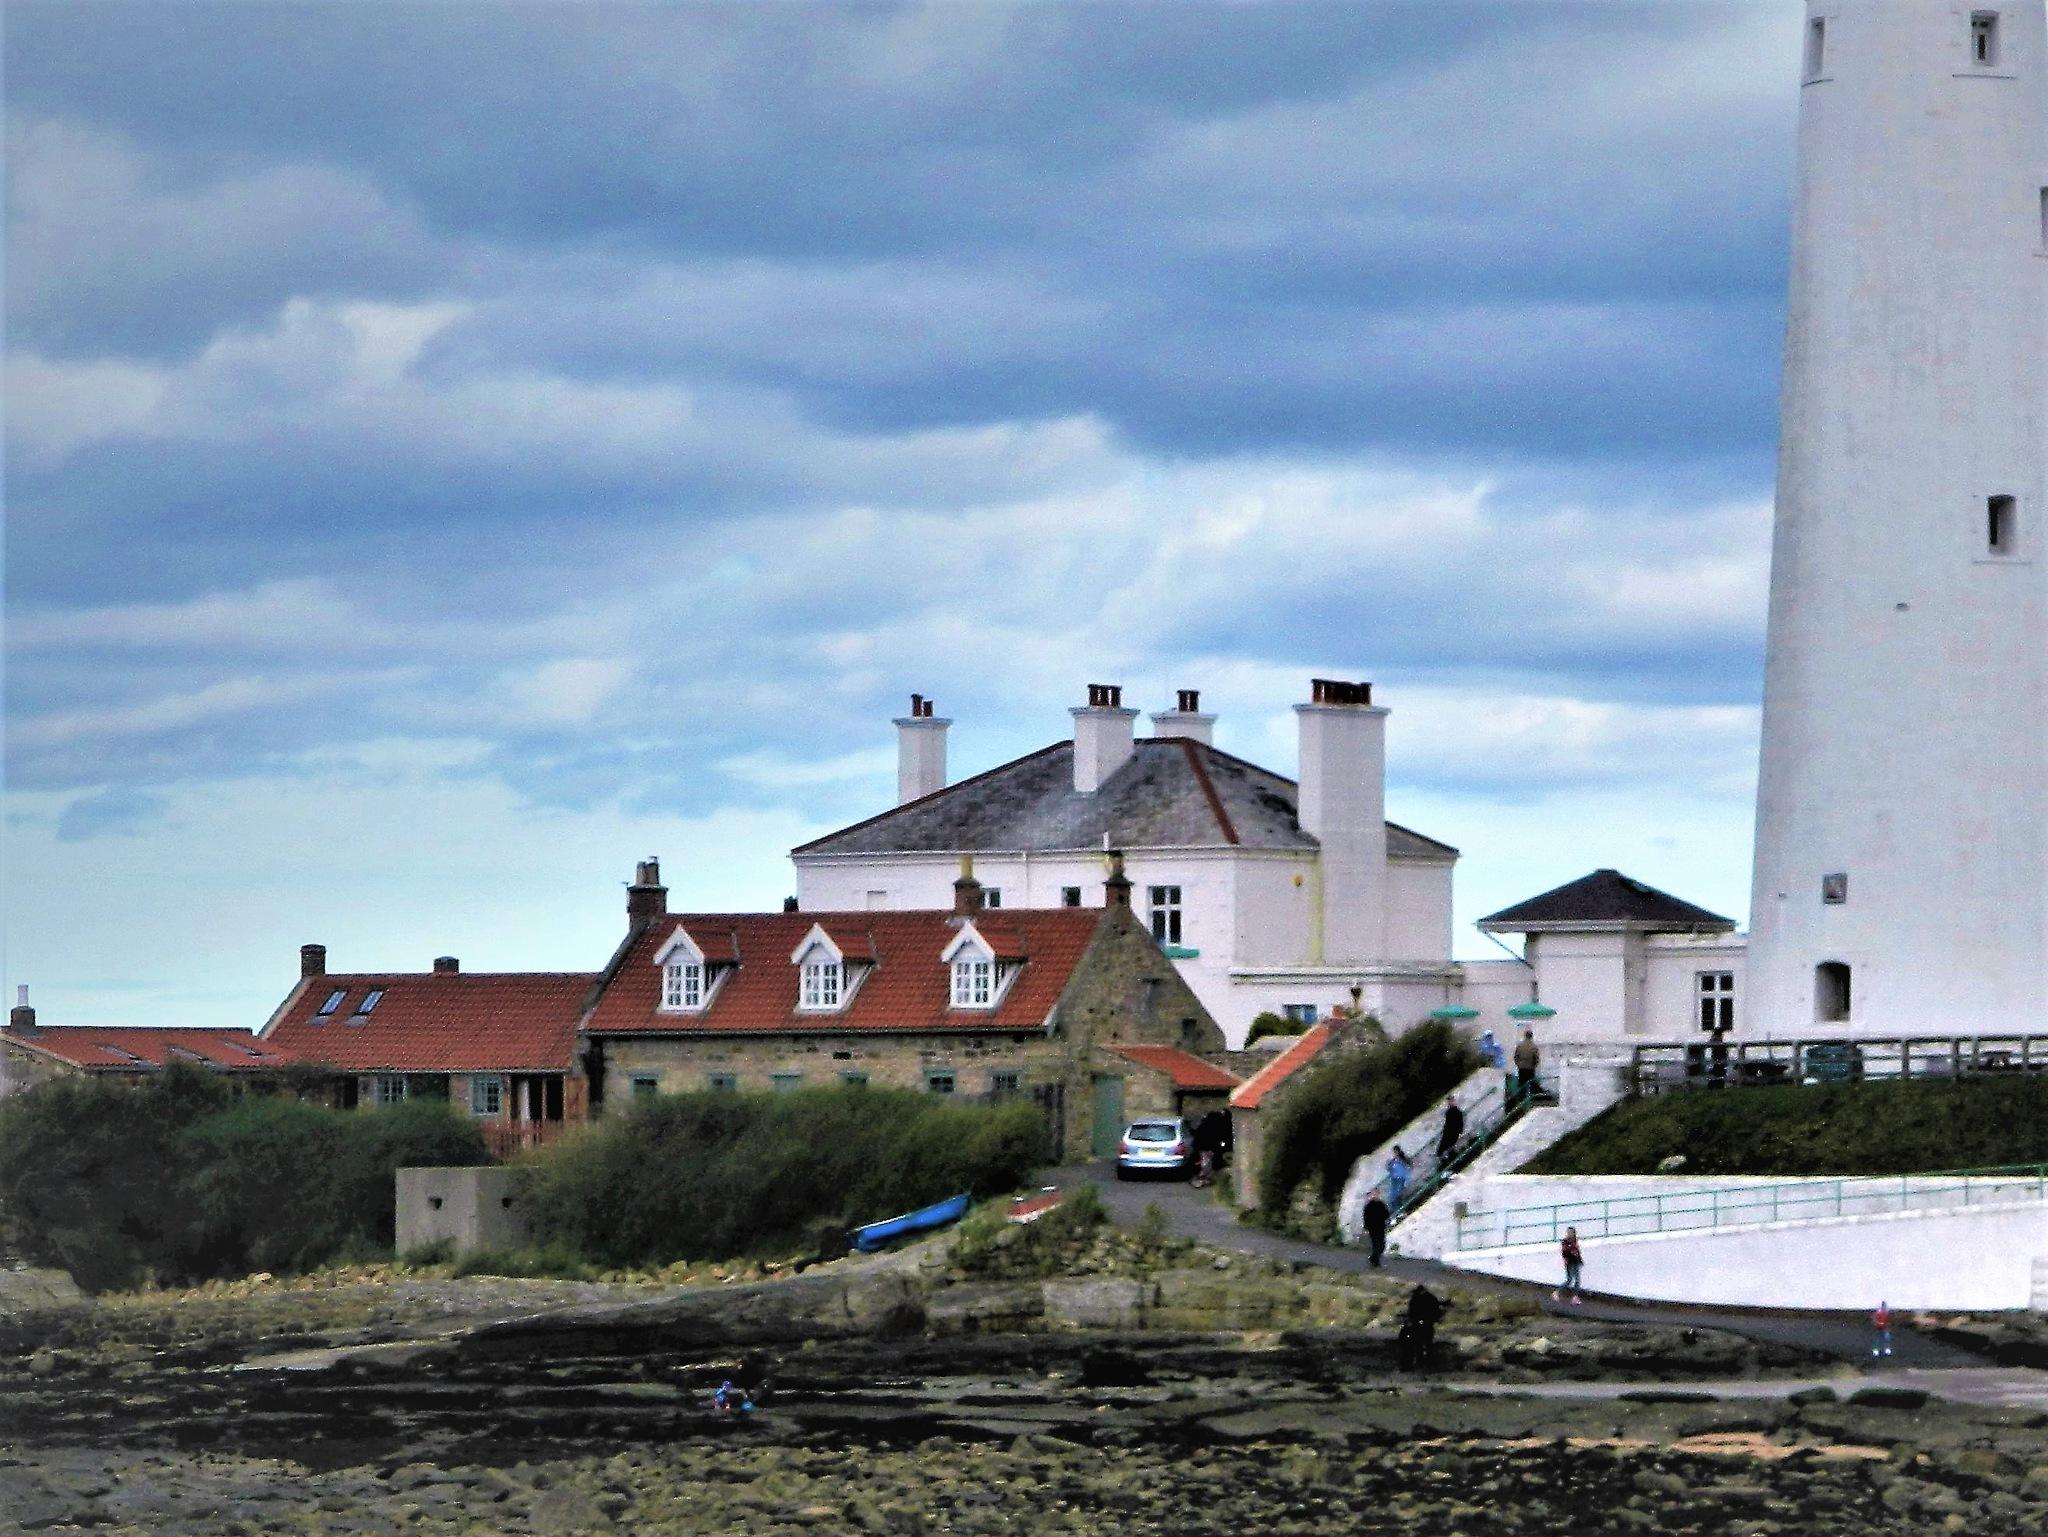 Saint mary's , Whitley bay  by bryan dellbridge